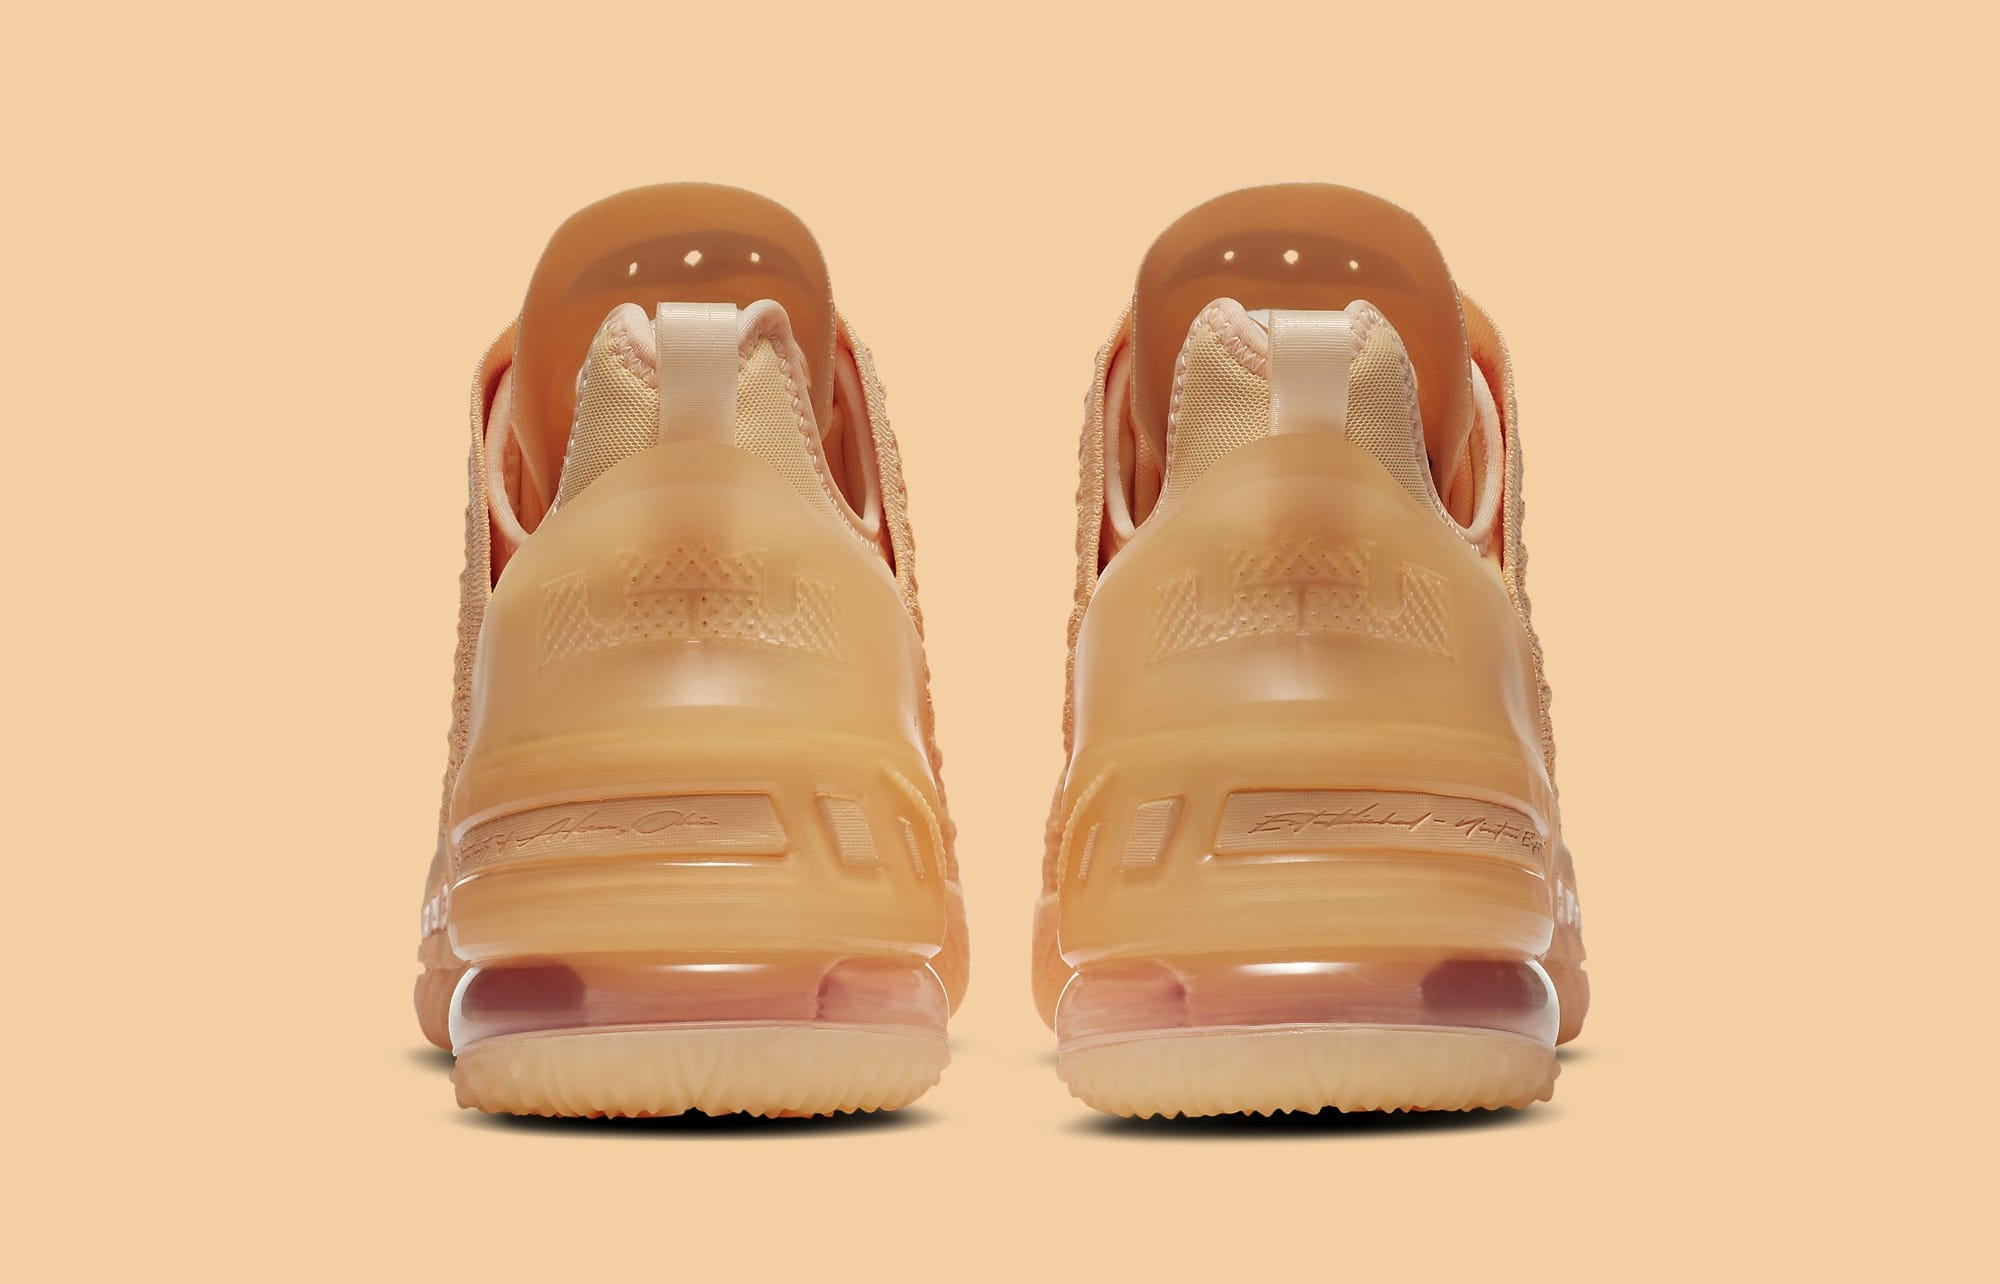 Nike LeBron 18 'Melon Tint' DB8148-801 Heel